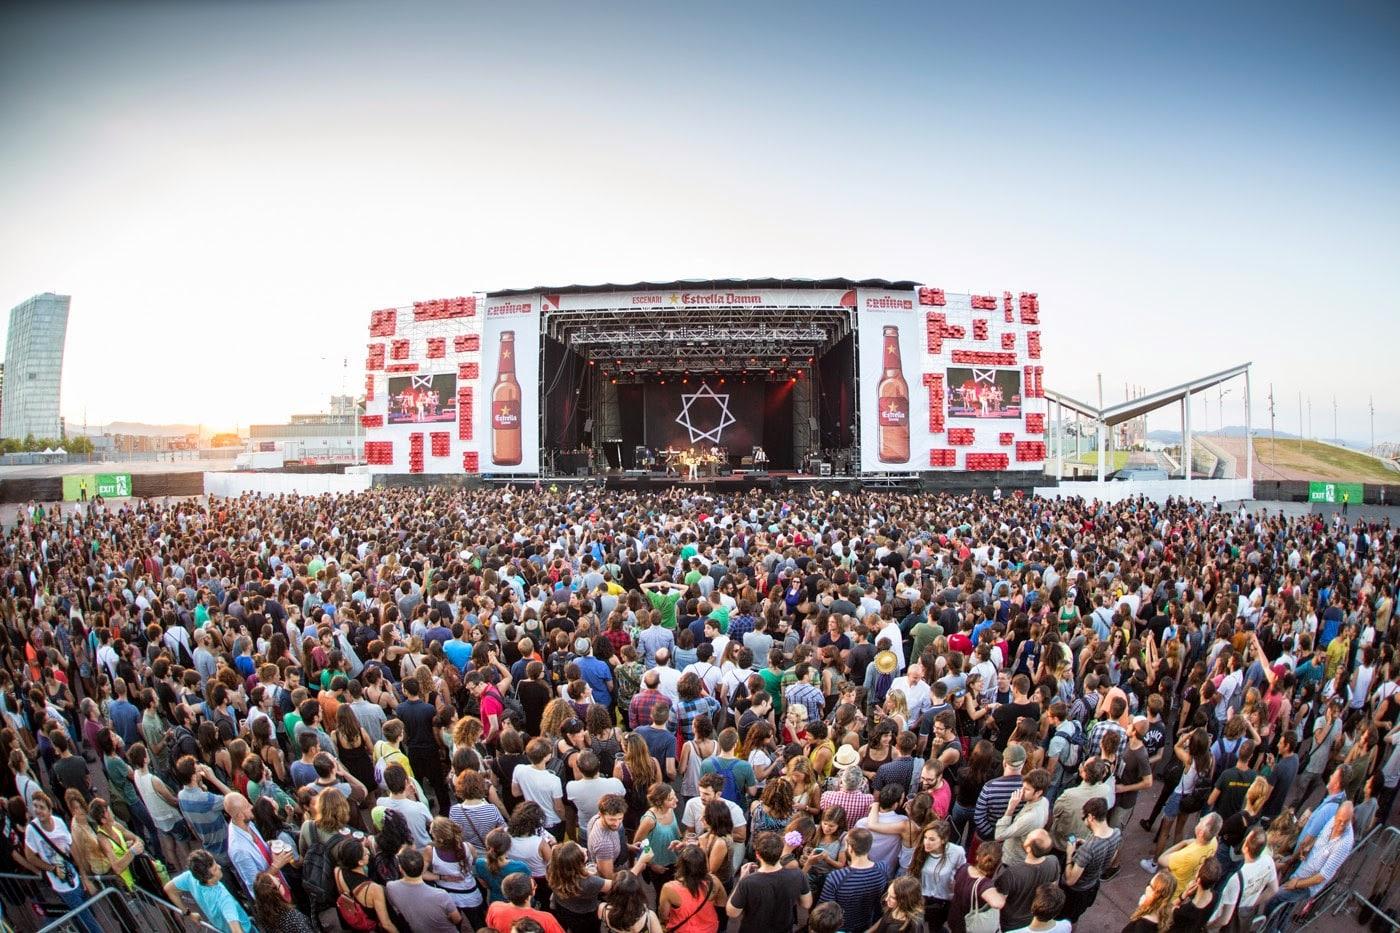 8-10 июня 2016. Cruilla Barcelona. Барселона